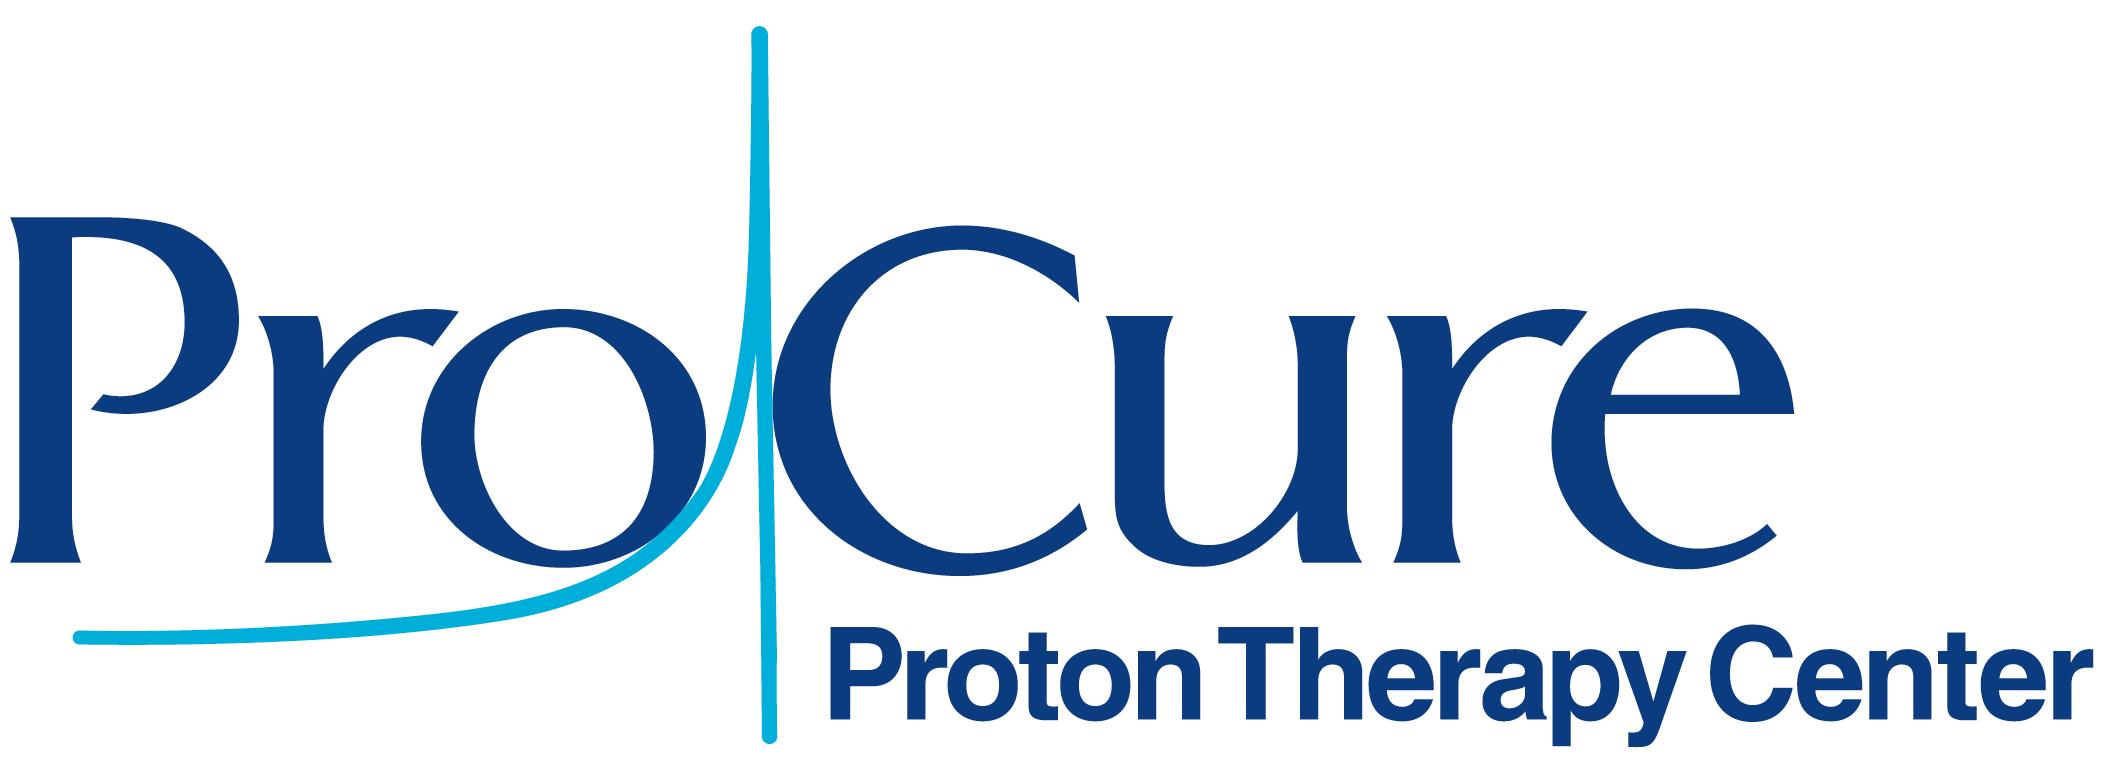 Procure_Logo.12.13.13.png